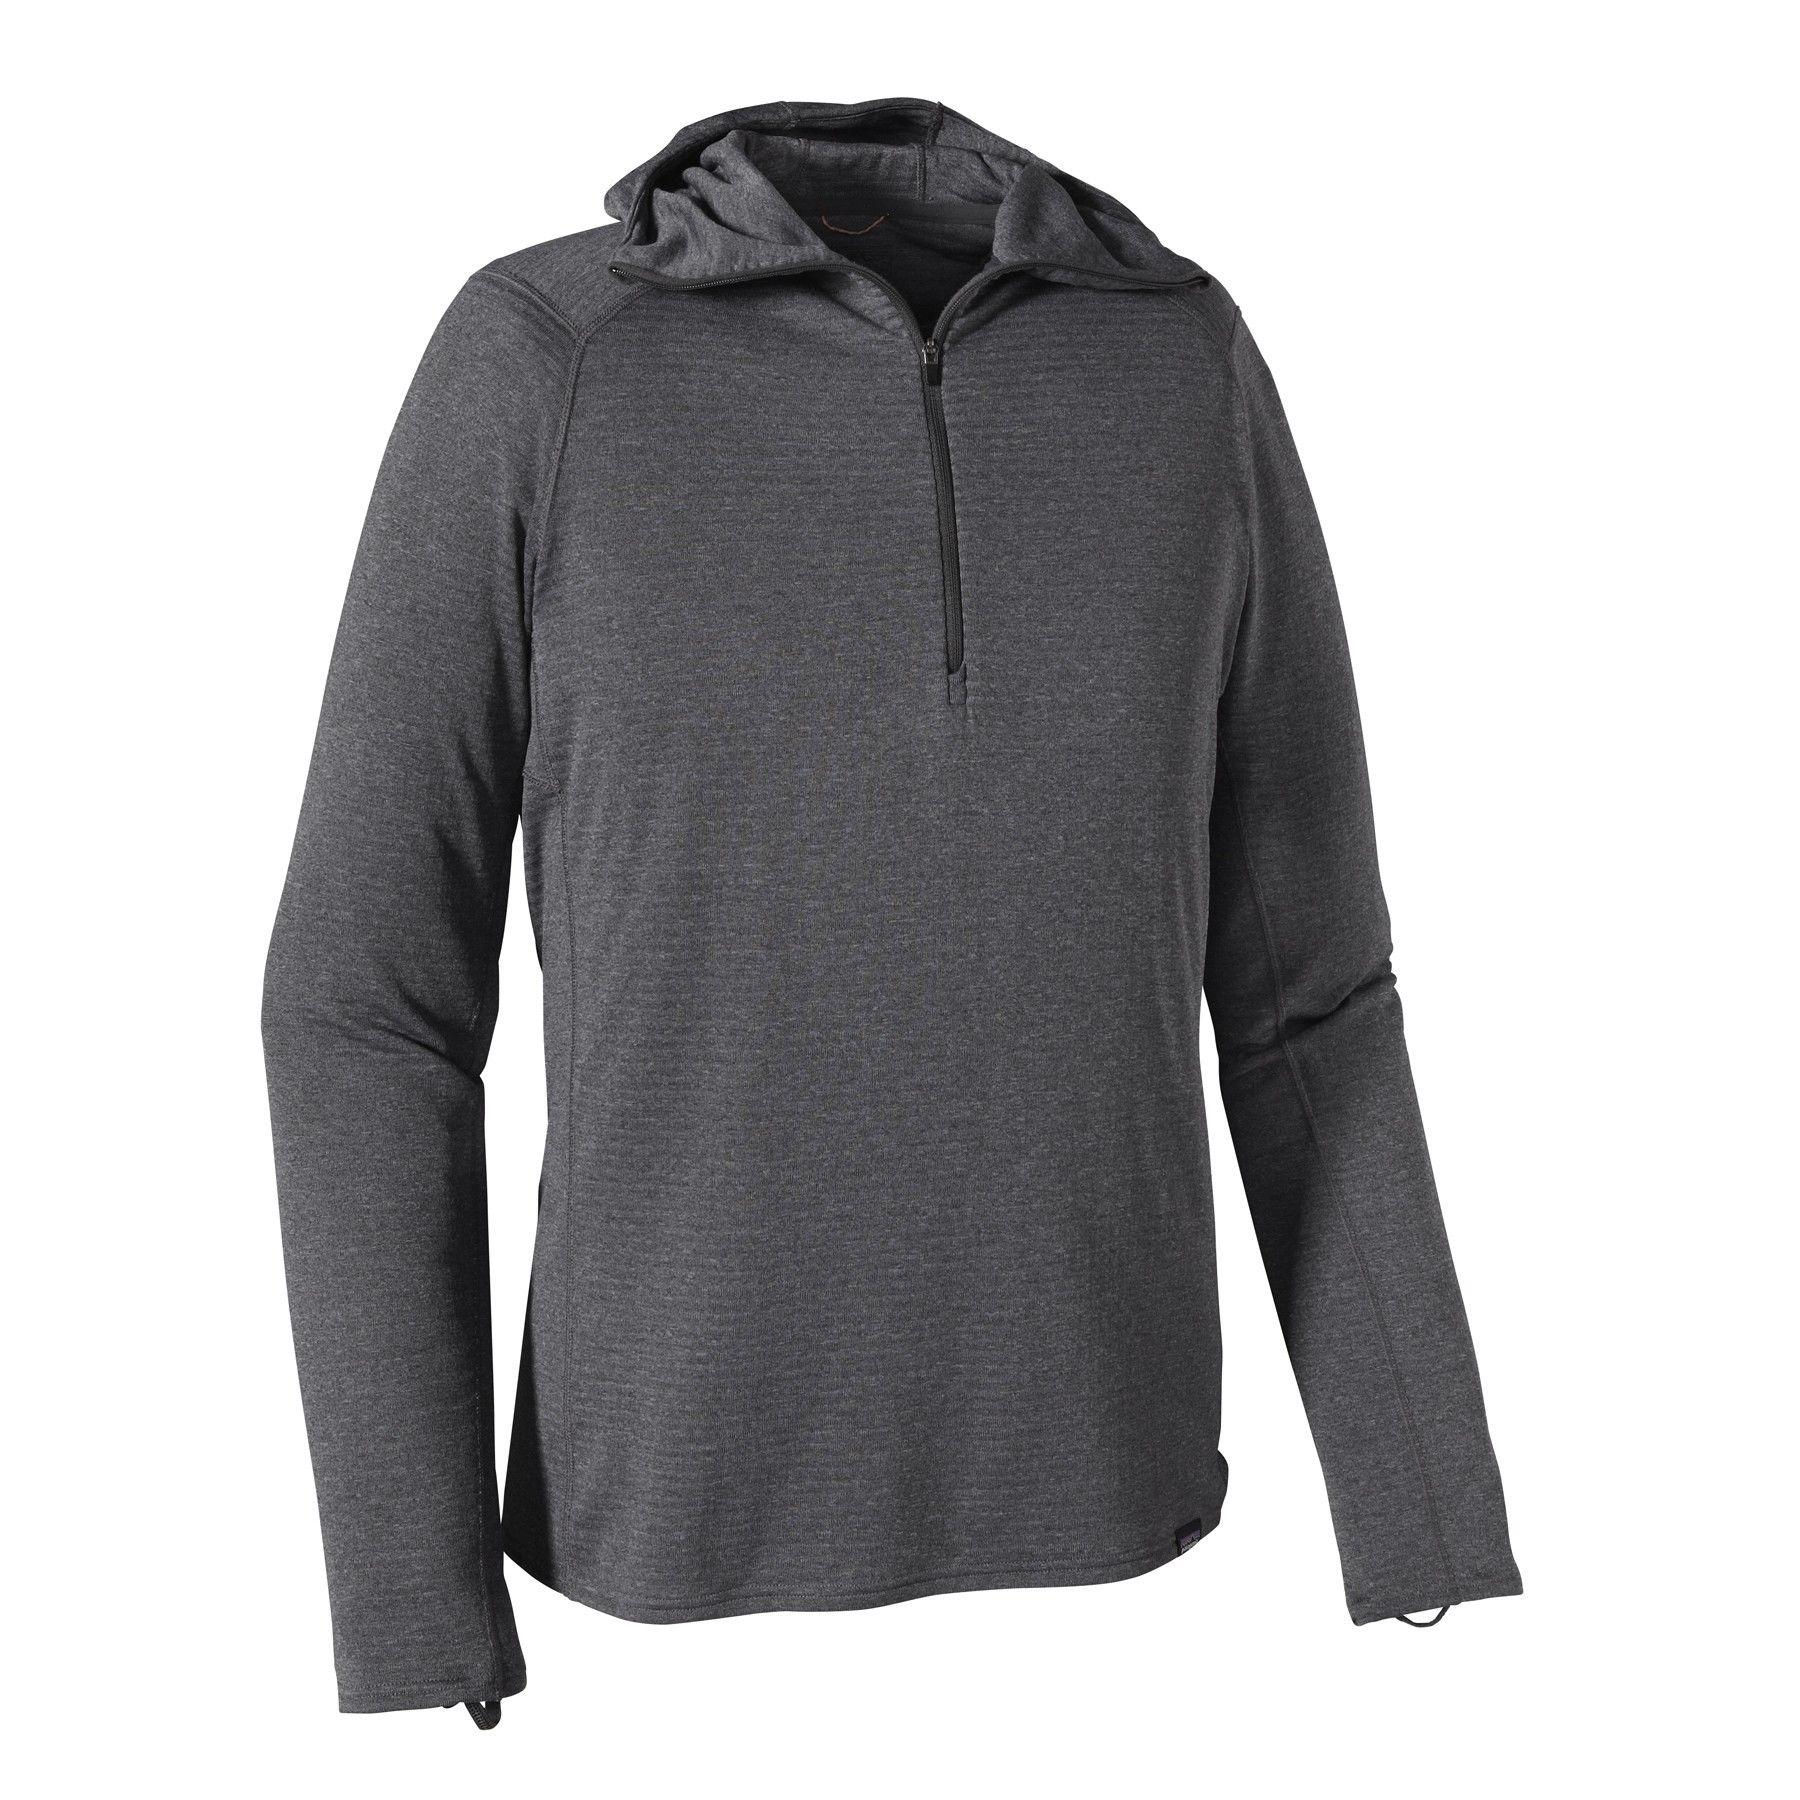 Patagonia M Capilene Thermal Weight Zip Neck Hoody | Herren Langarm-Shirt